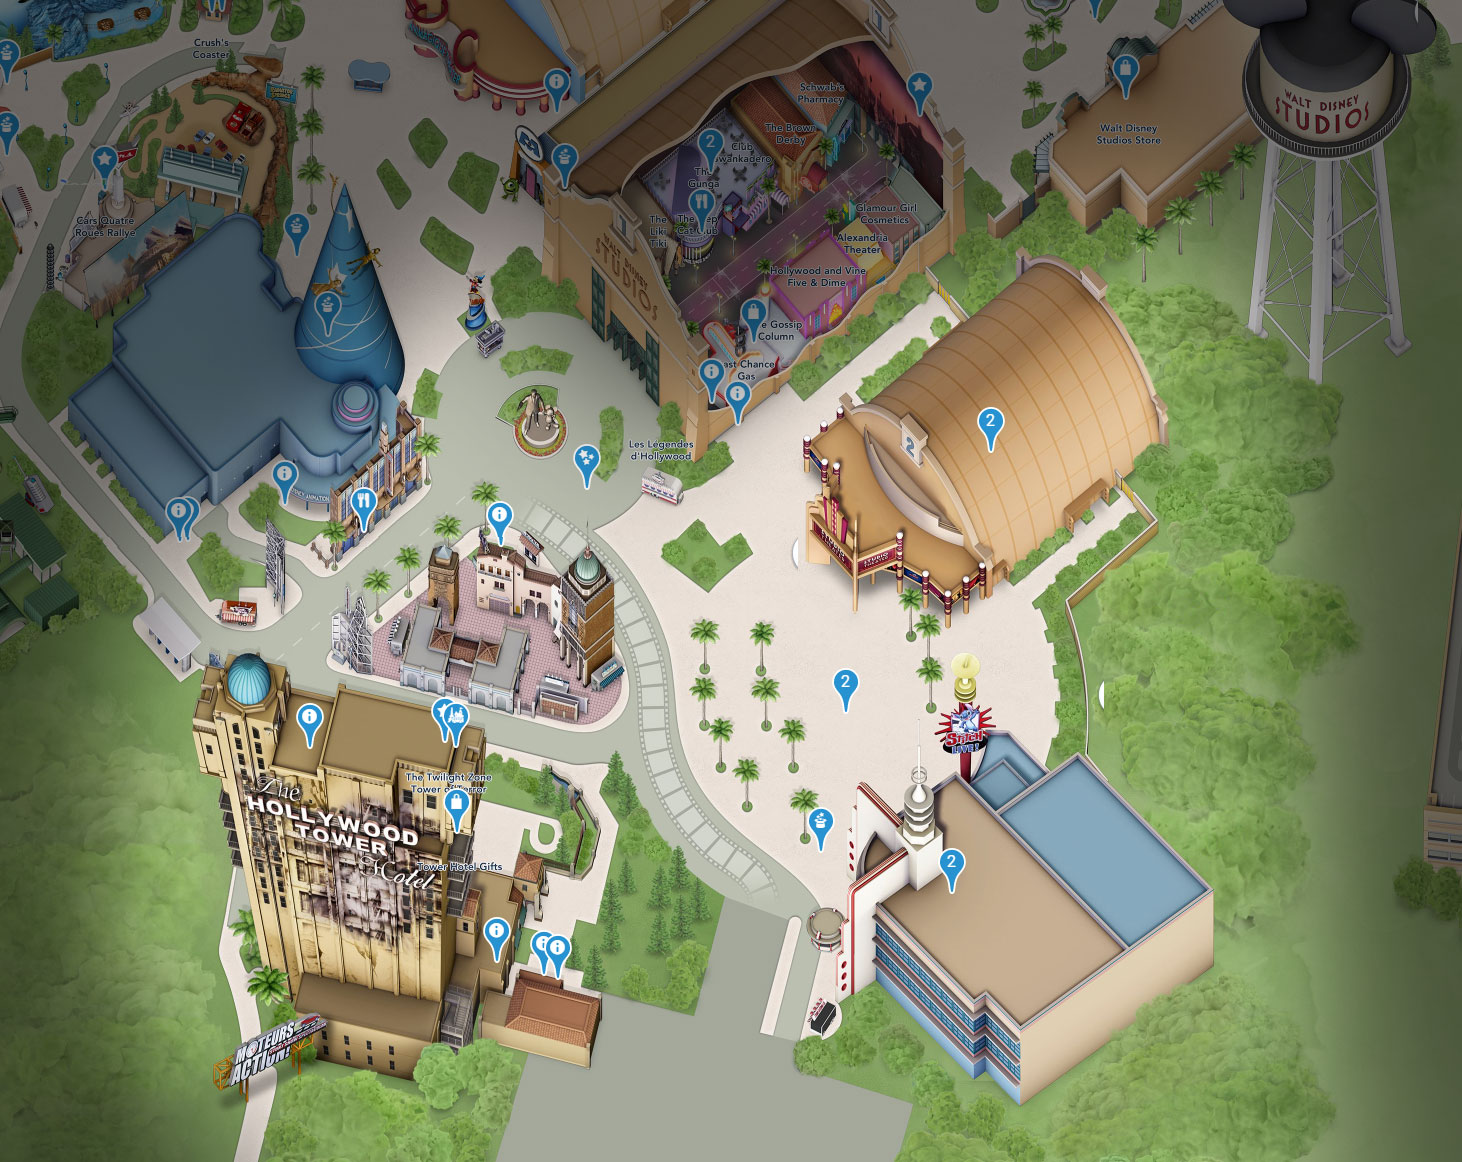 plan production courtyard walt studios disney disneyland paris